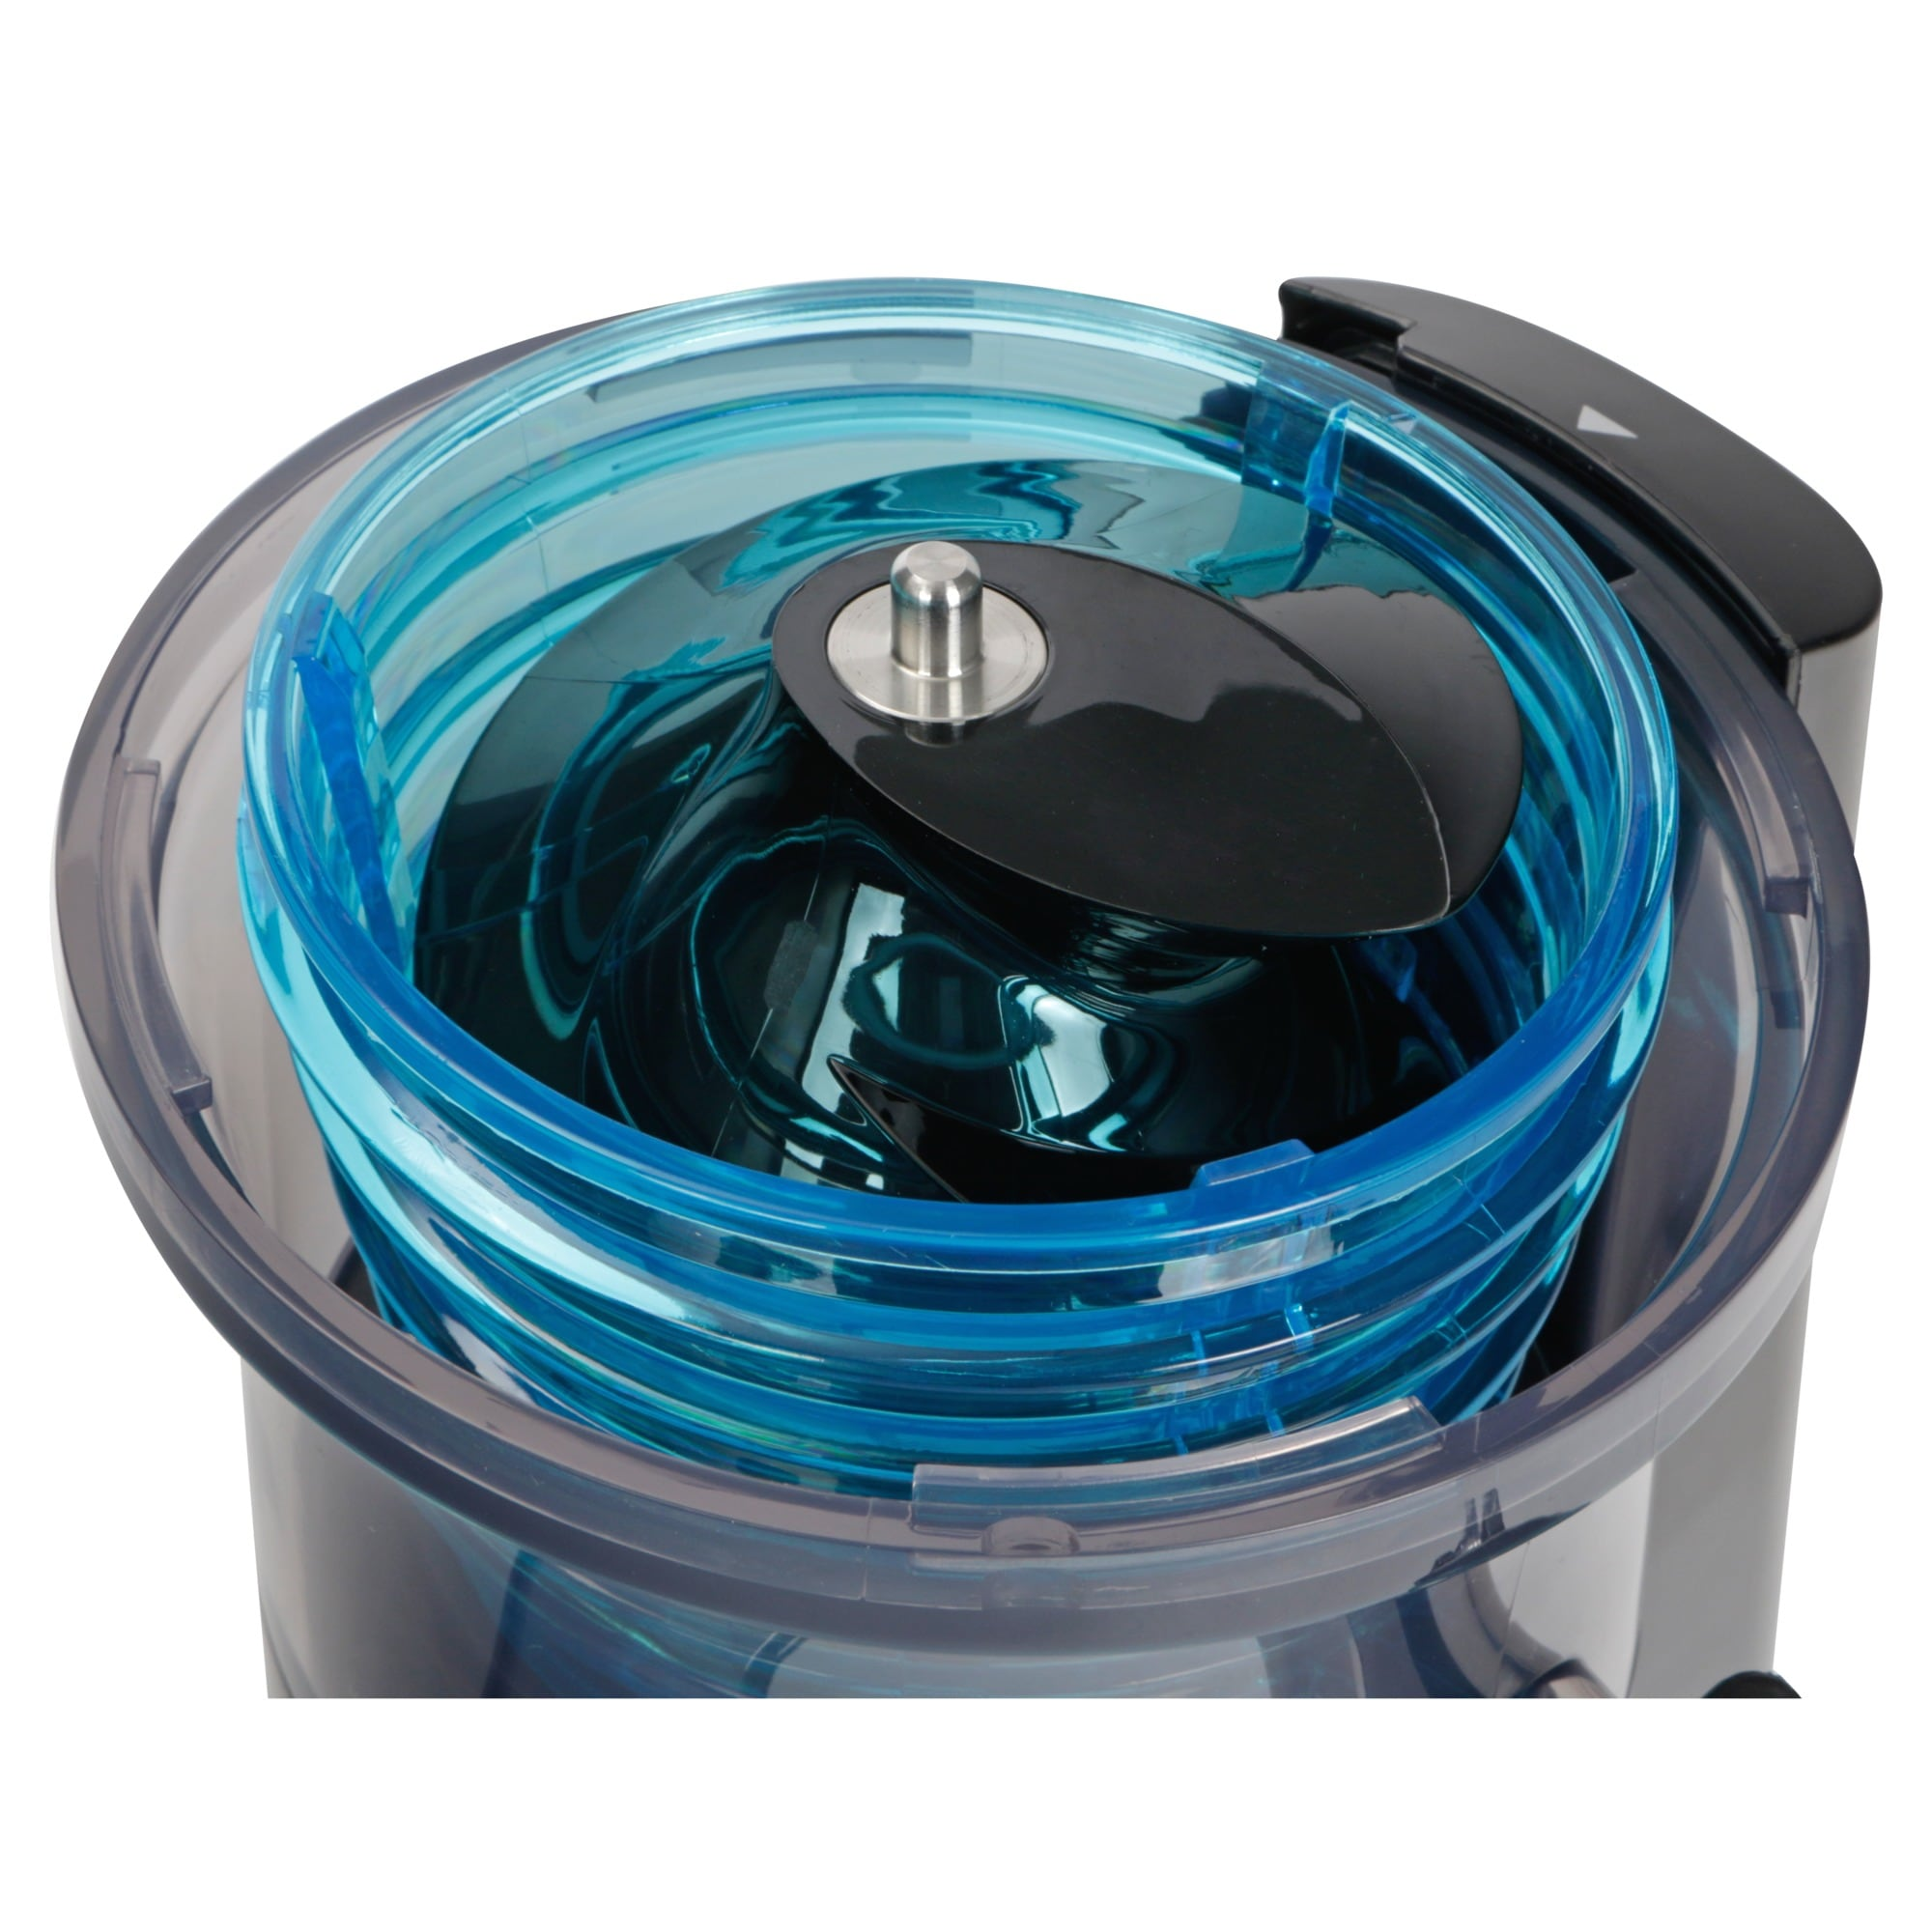 Panasonic Entsafter Slow Juicer MJ-L600